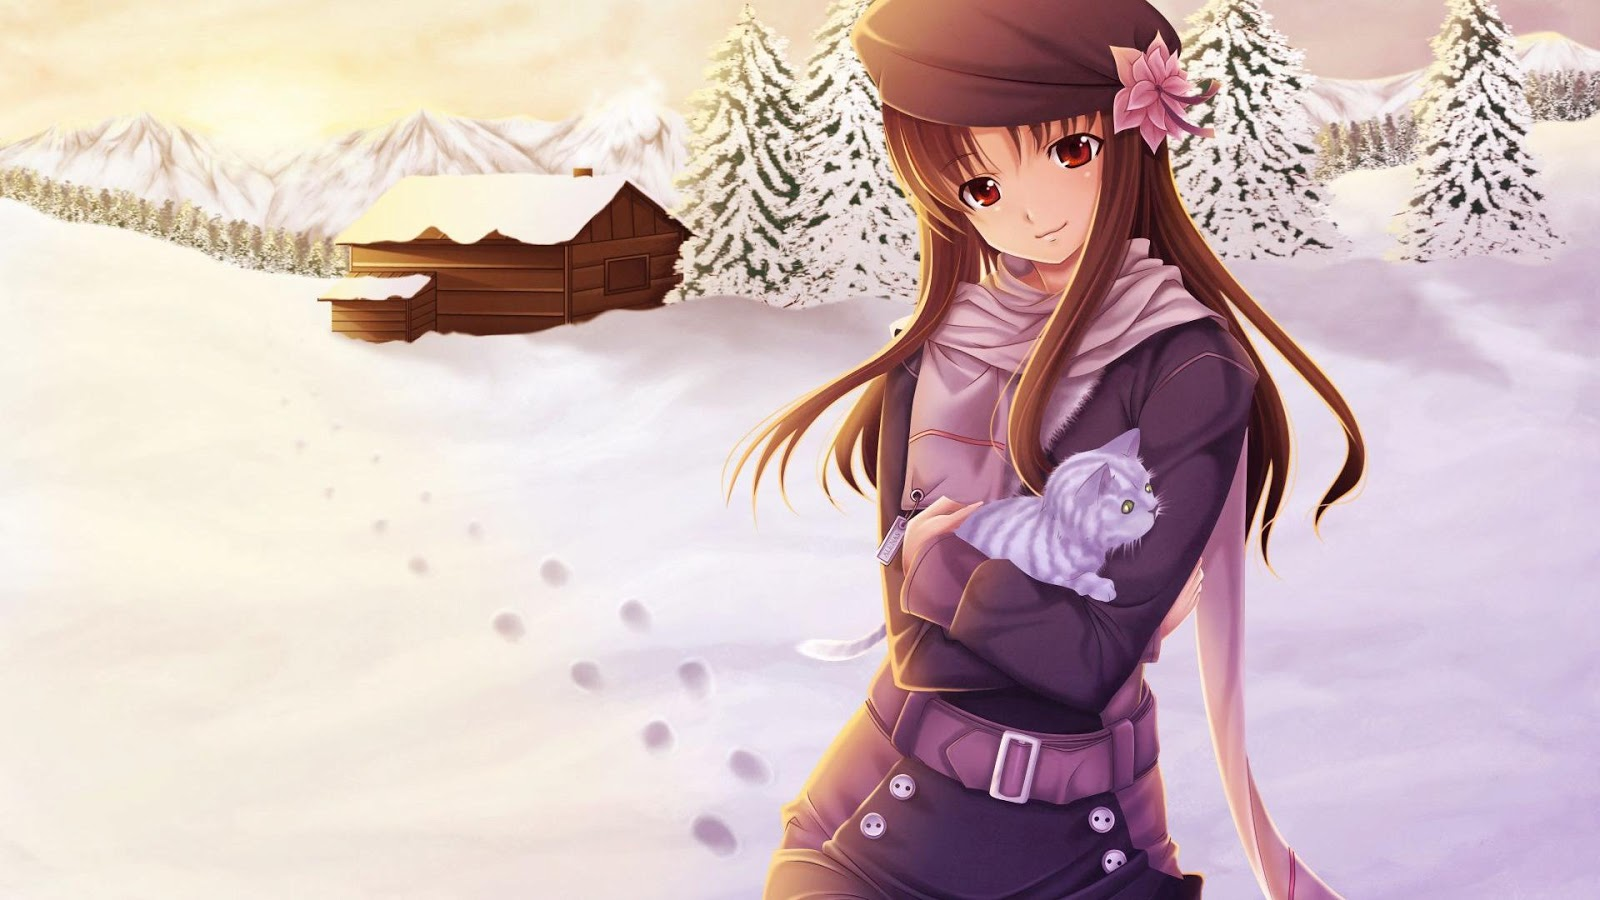 18+ Wallpaper Anime HD Keren Terbaru   Deloiz Wallpaper